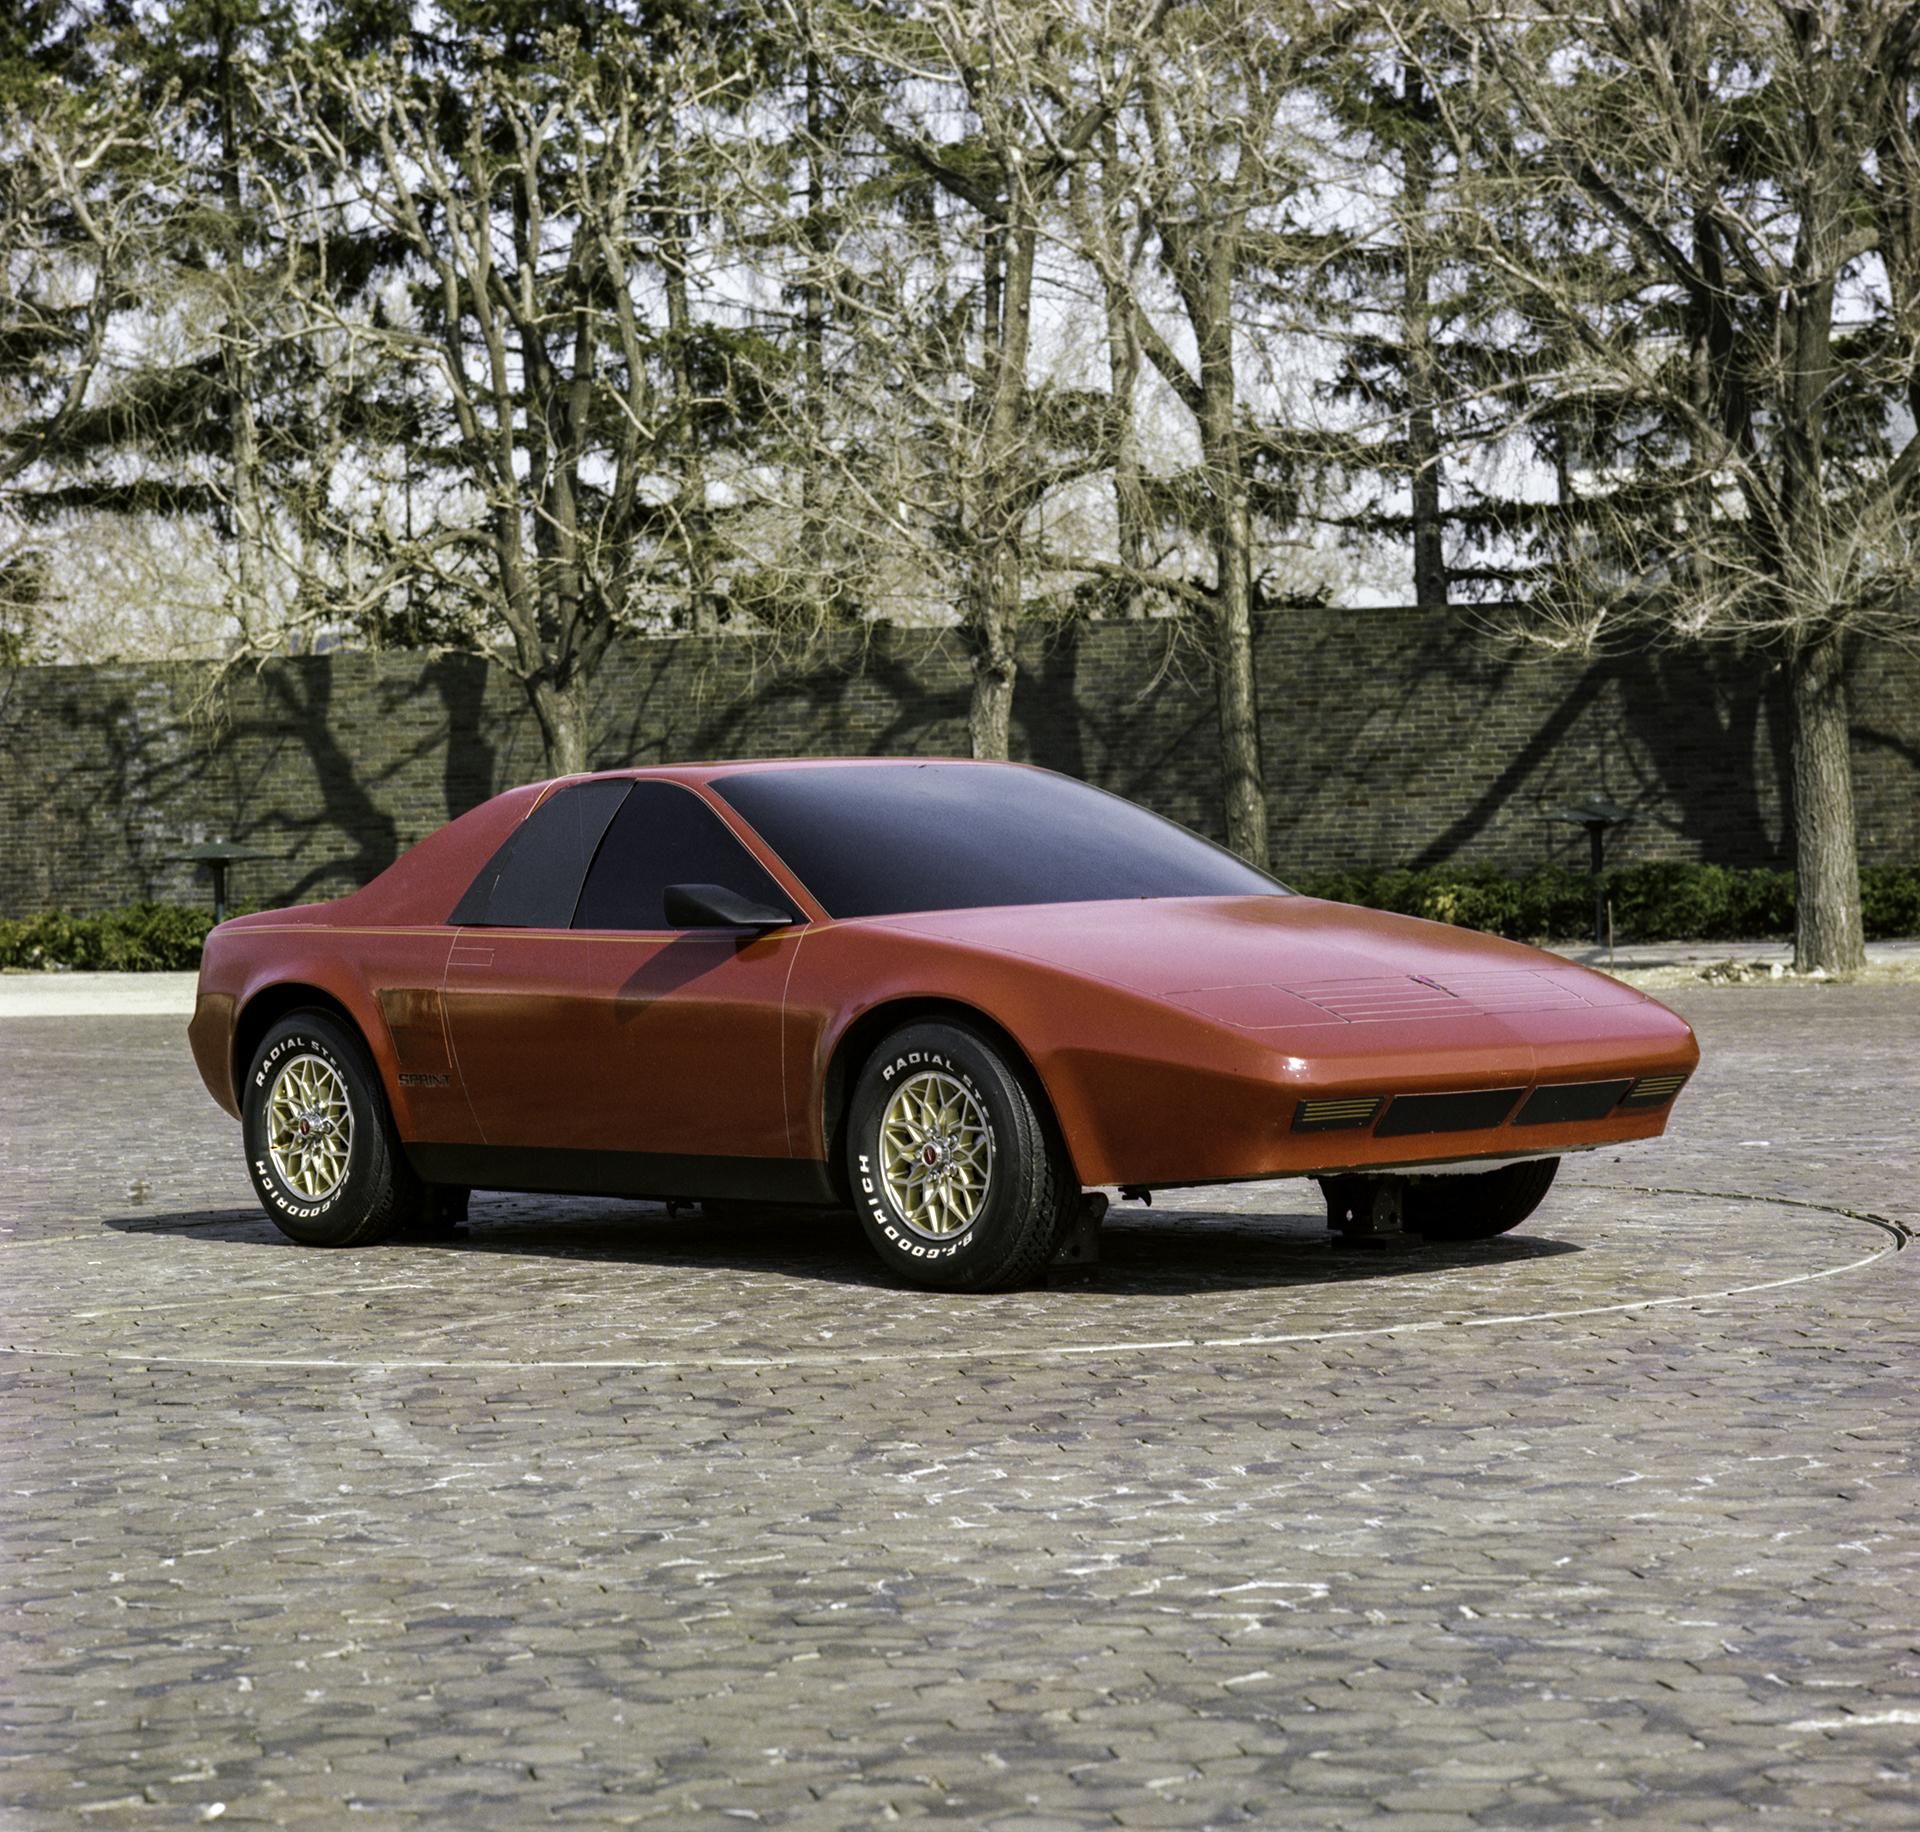 1984 Pontiac P body Fiero front three-quarter